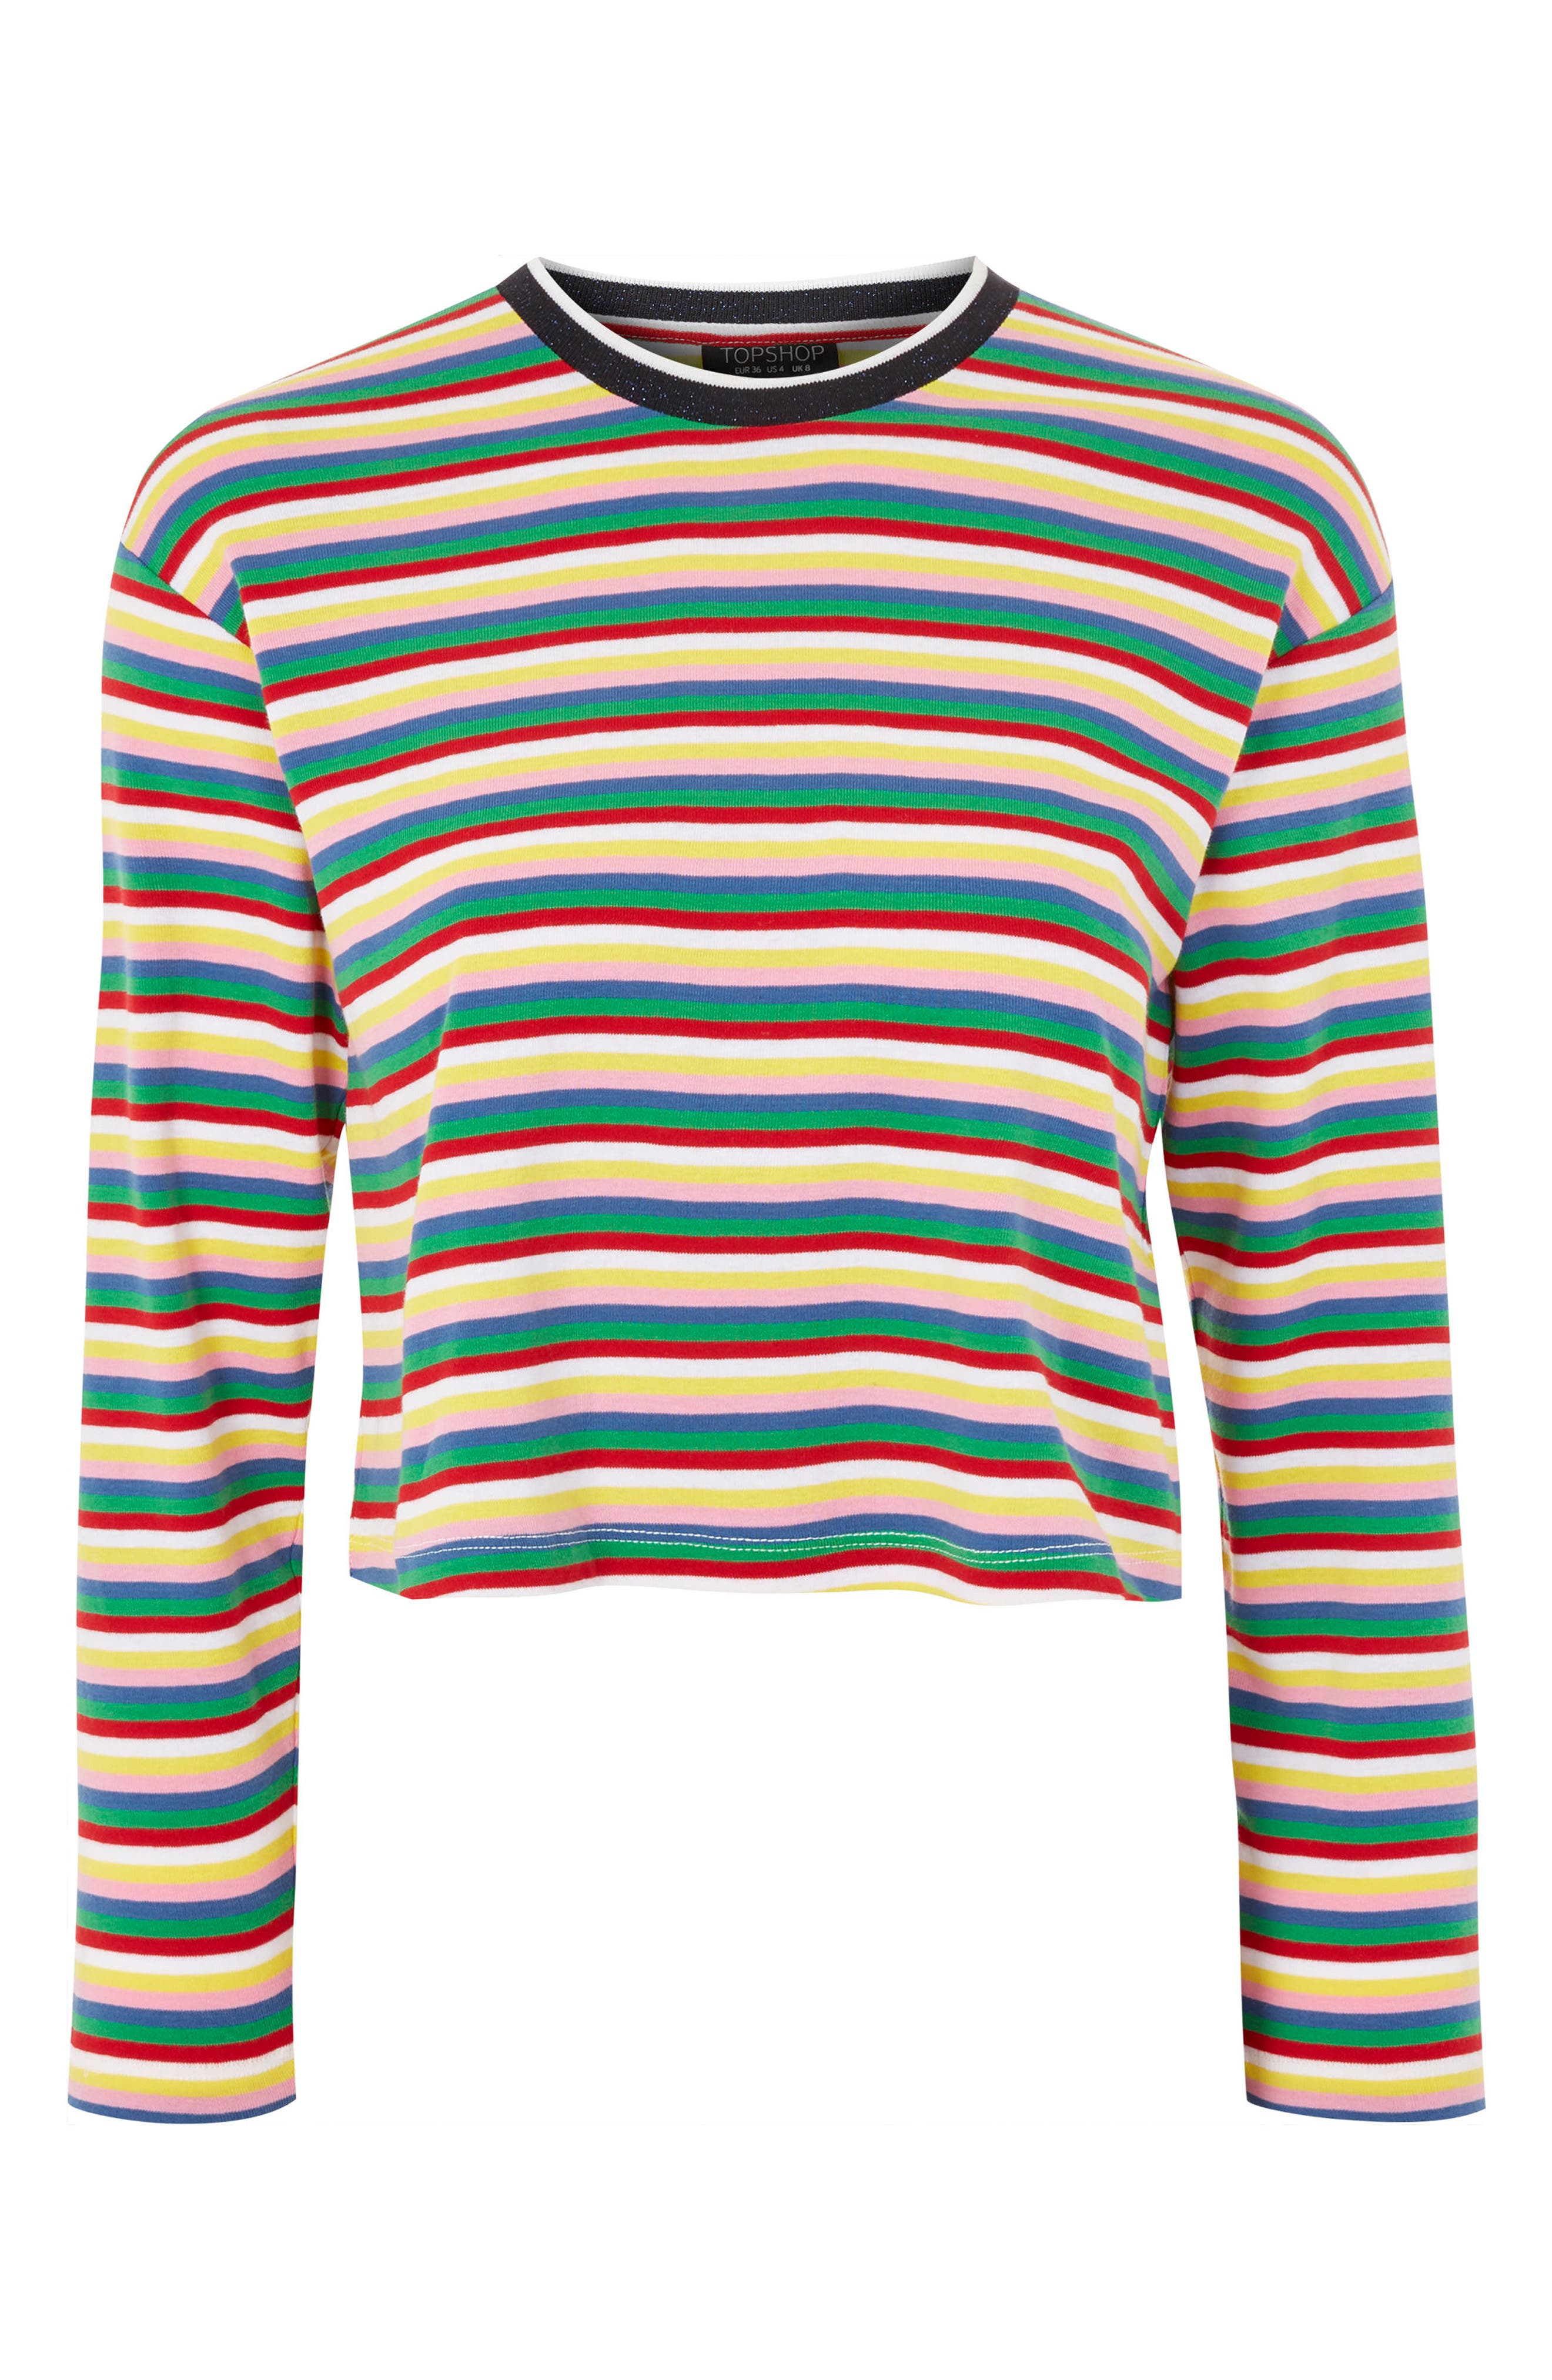 Topshop Rainbow Stripe Cotton Pullover